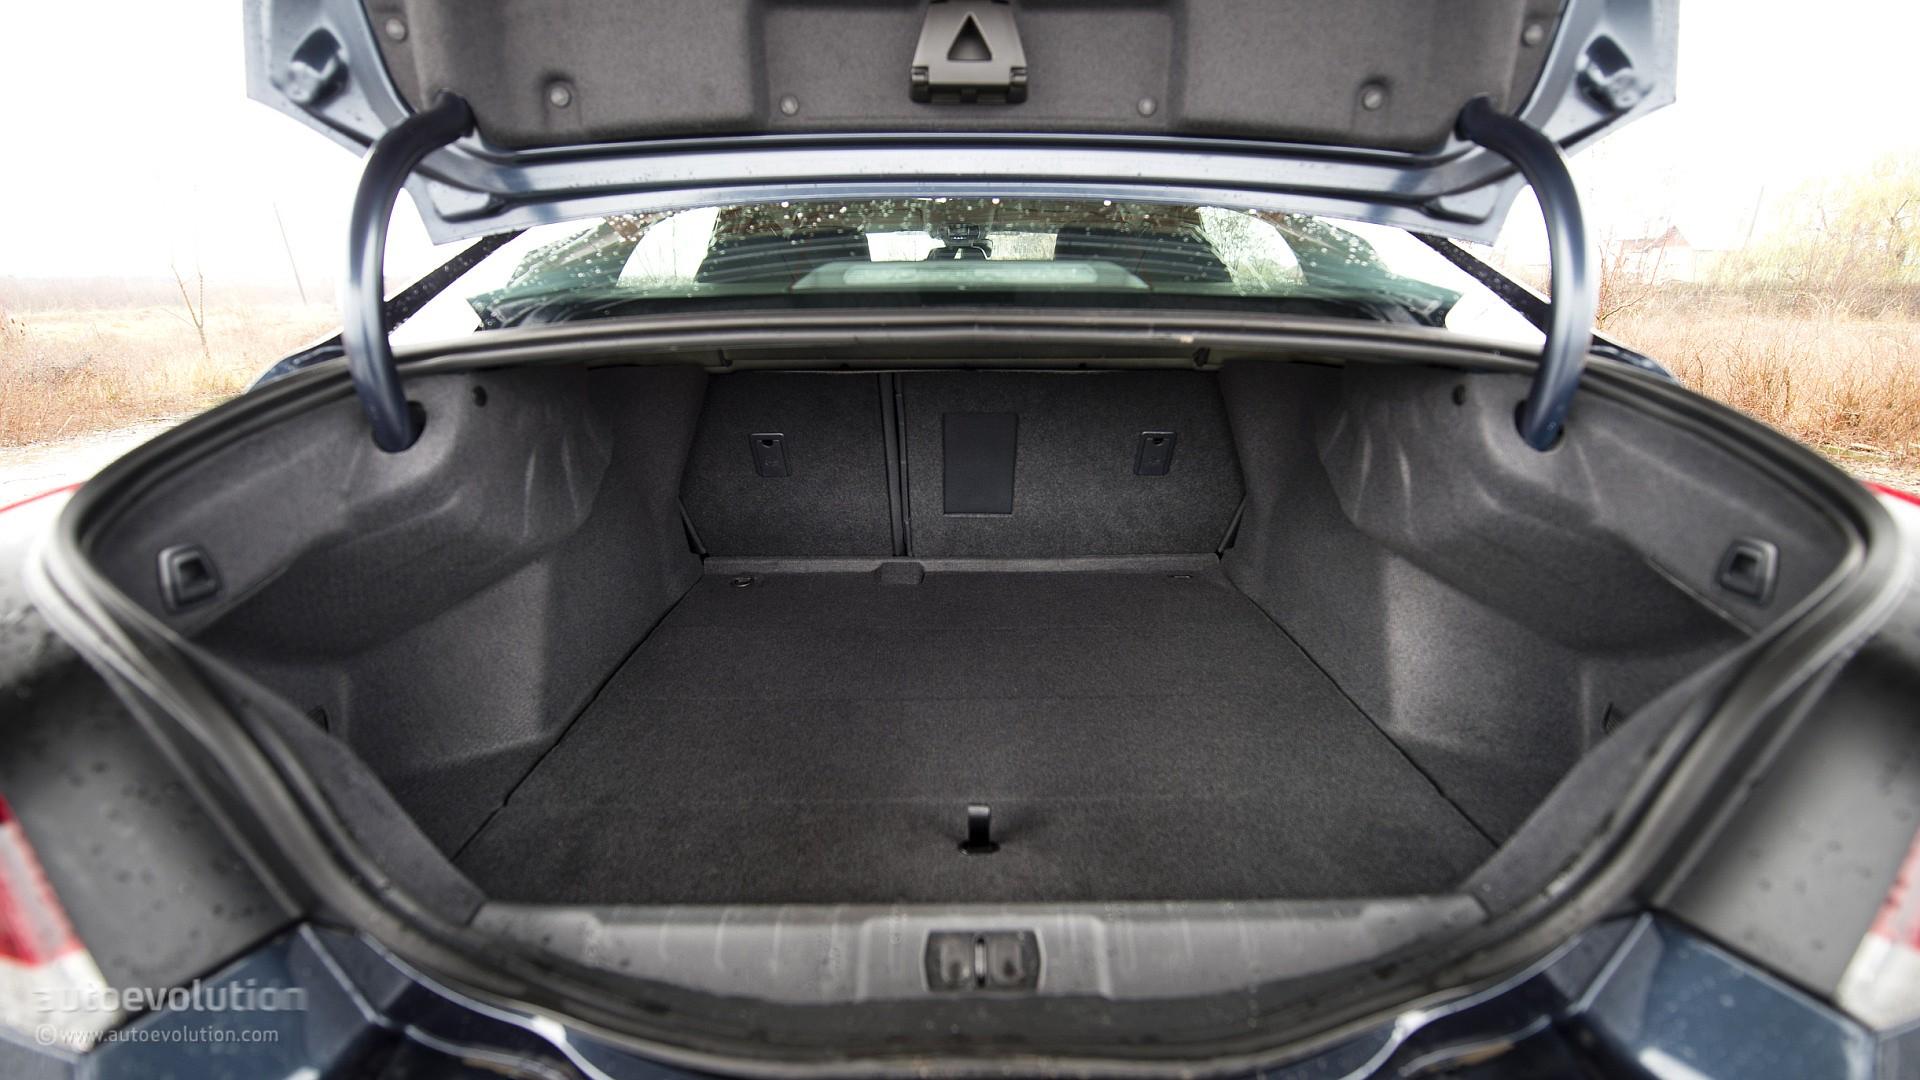 2015 Peugeot 508 Review Autoevolution Kompresor Chevrolet New Captiva Diesel 2011